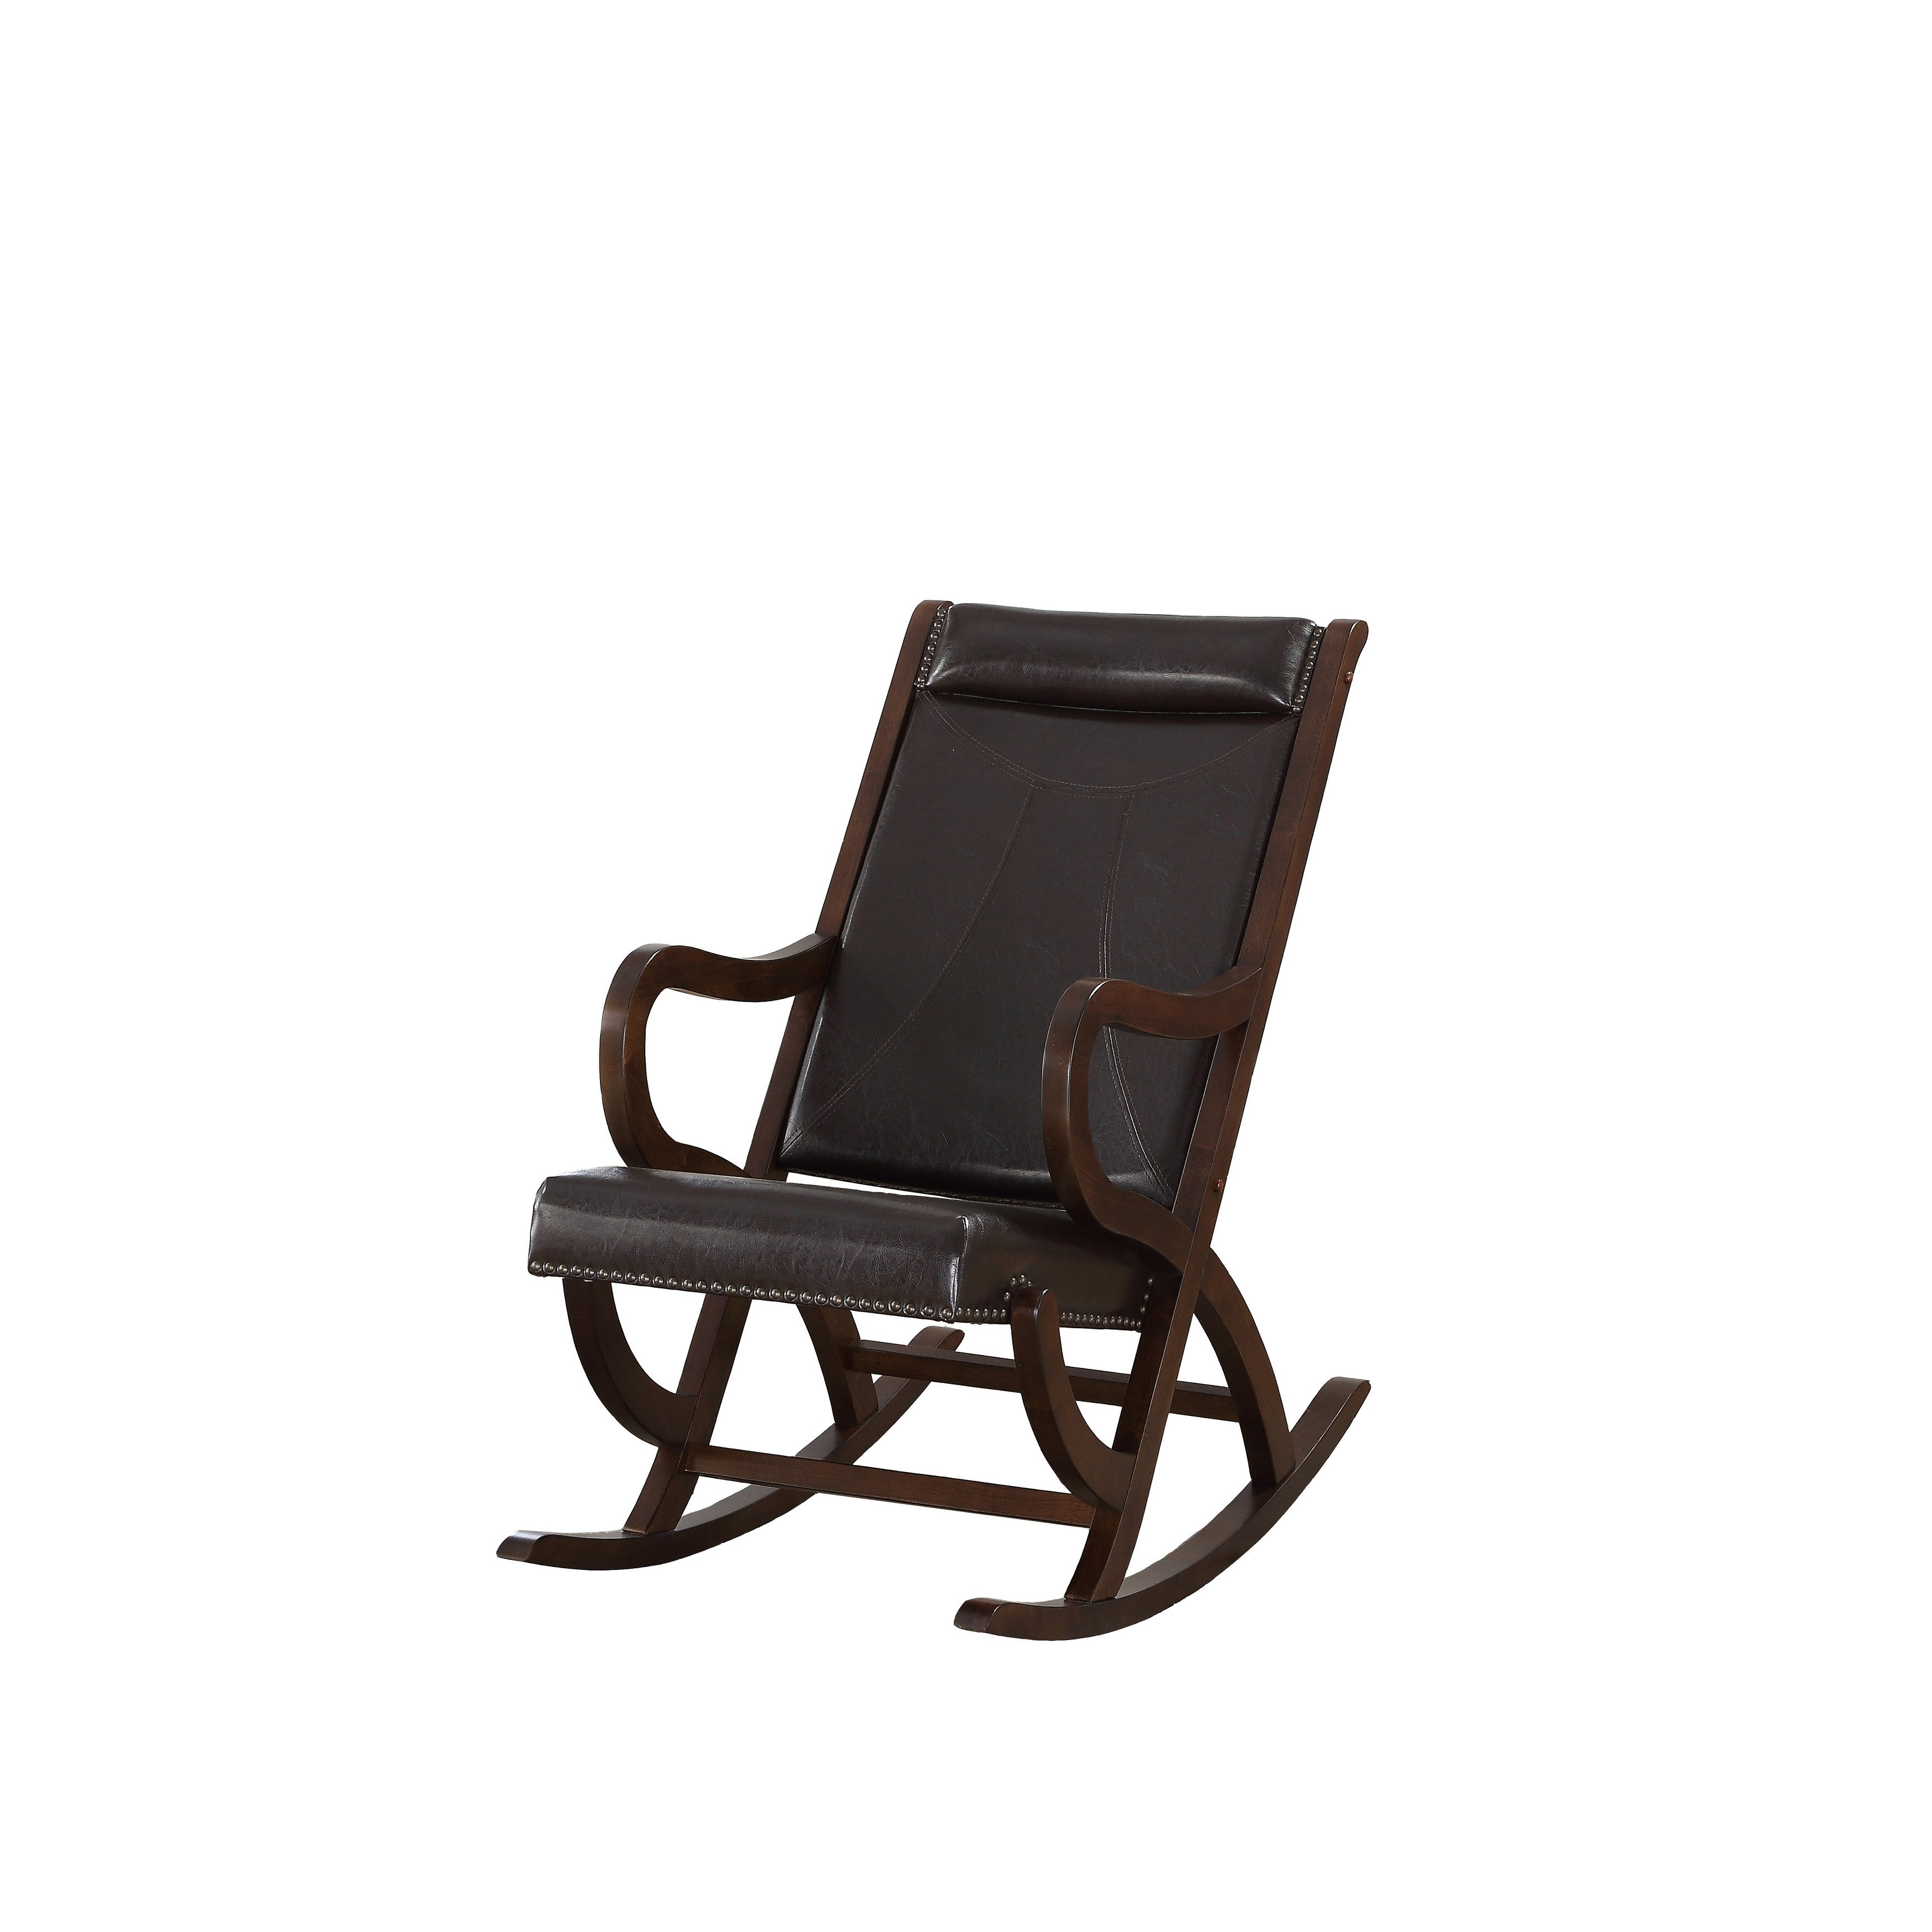 Carbon Loft Ariel Rocking Chair In Espresso Pu And Walnut Pertaining To Carbon Loft Ariel Rocking Chairs In Espresso Pu And Walnut (View 3 of 20)